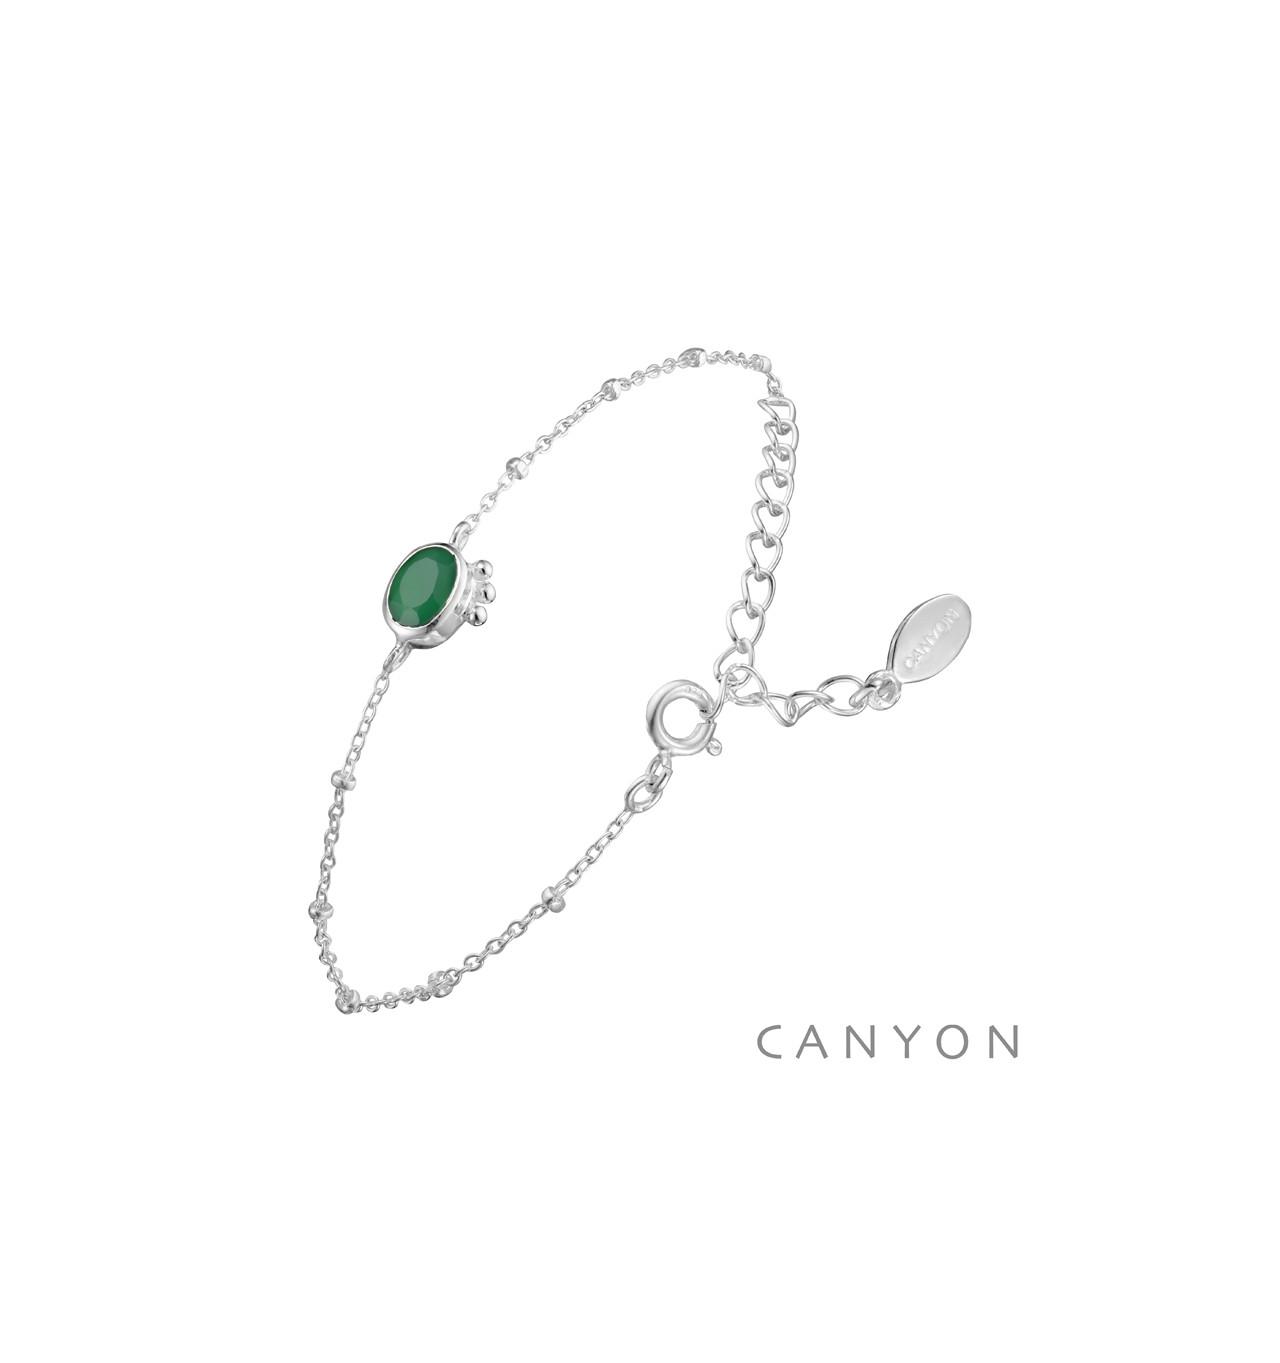 canyon-bracelet-argent-chainette-ovale-onyx vert-bijoux totem